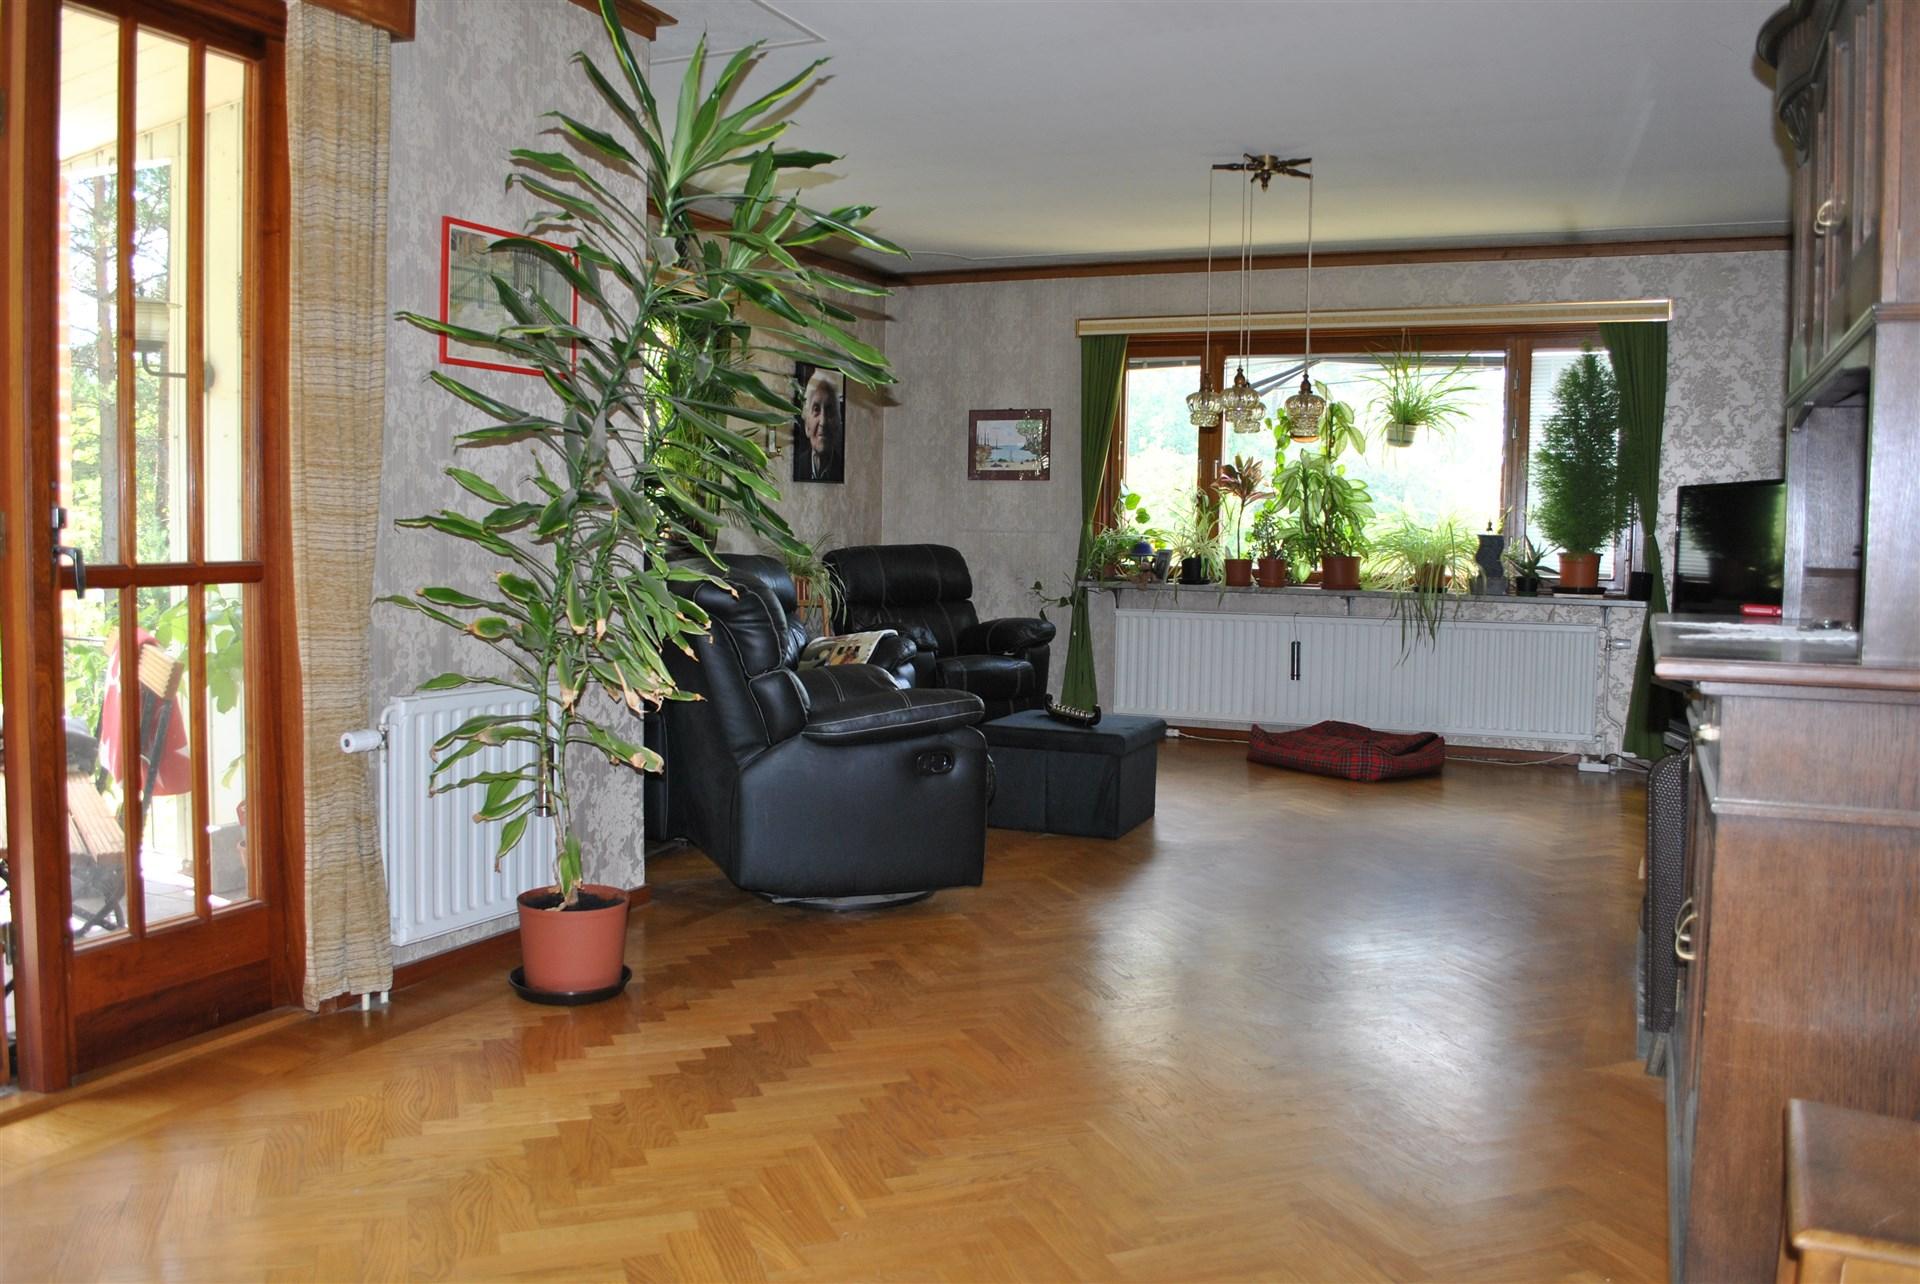 Vardagsrum med stavparkett